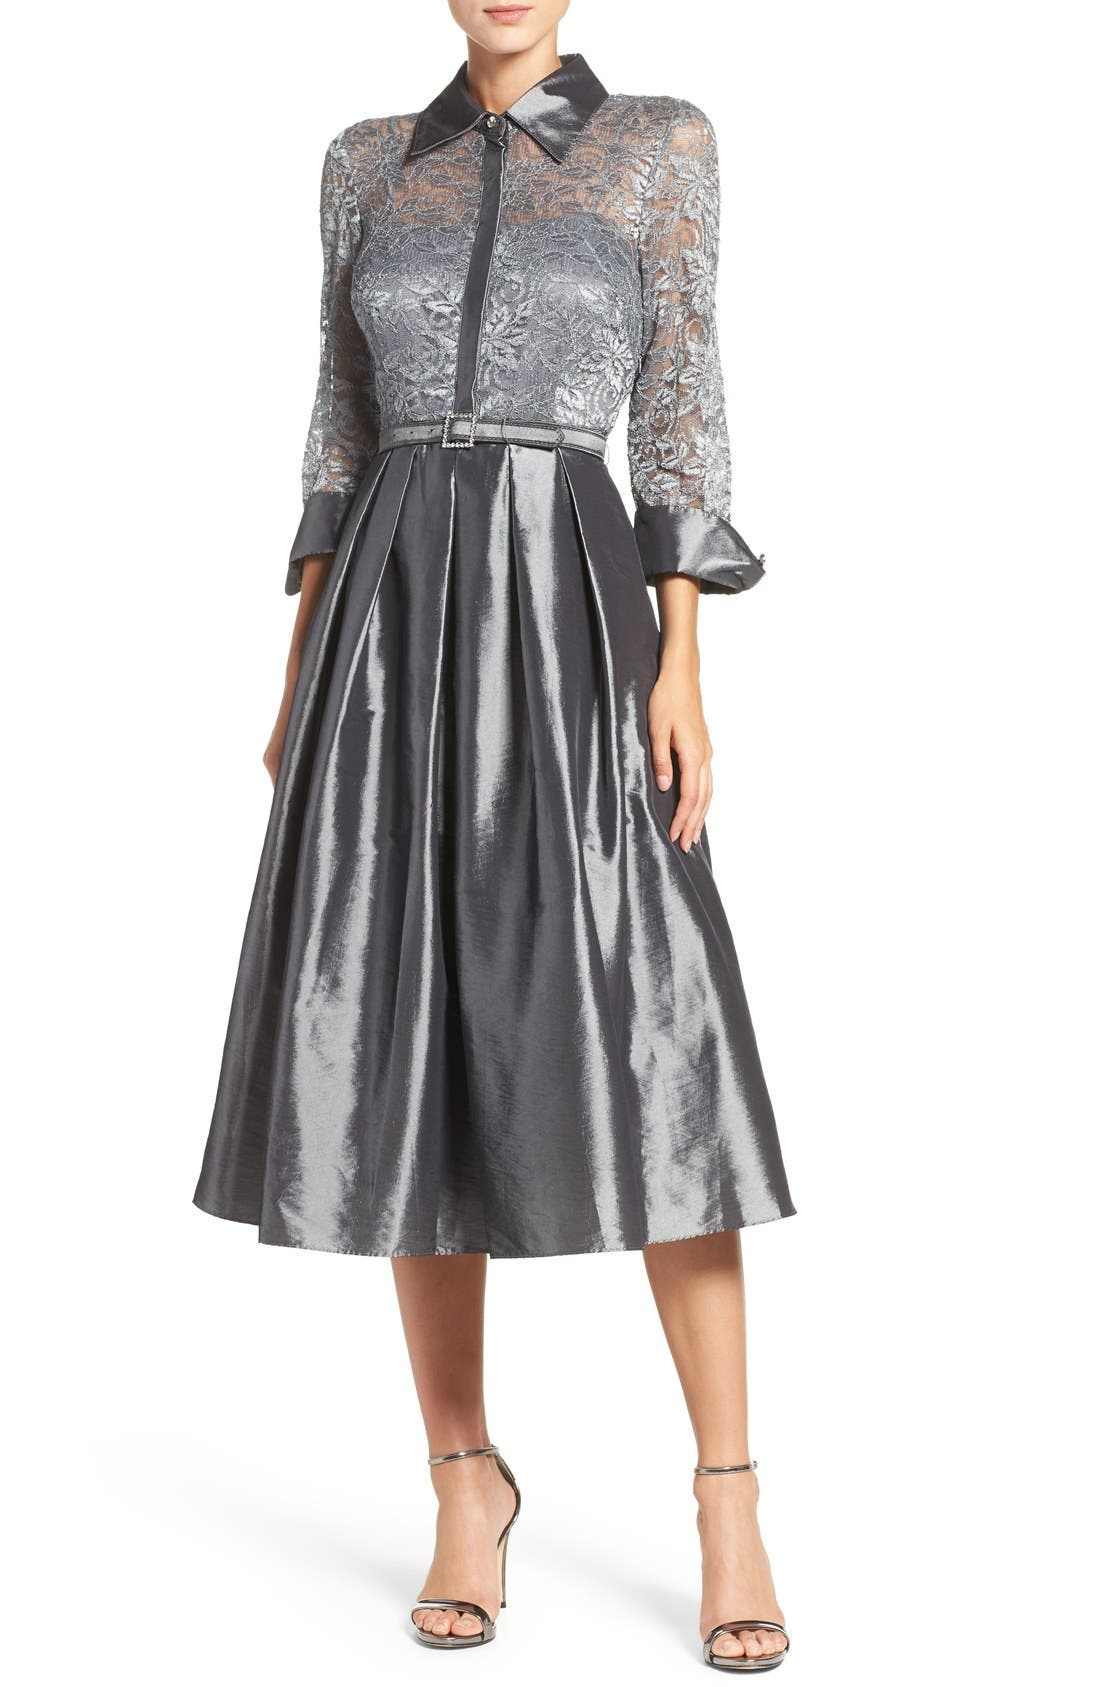 Alternate Image 1 Selected - Eliza J Mixed Media Fit & Flare Dress (Regular & Petite)